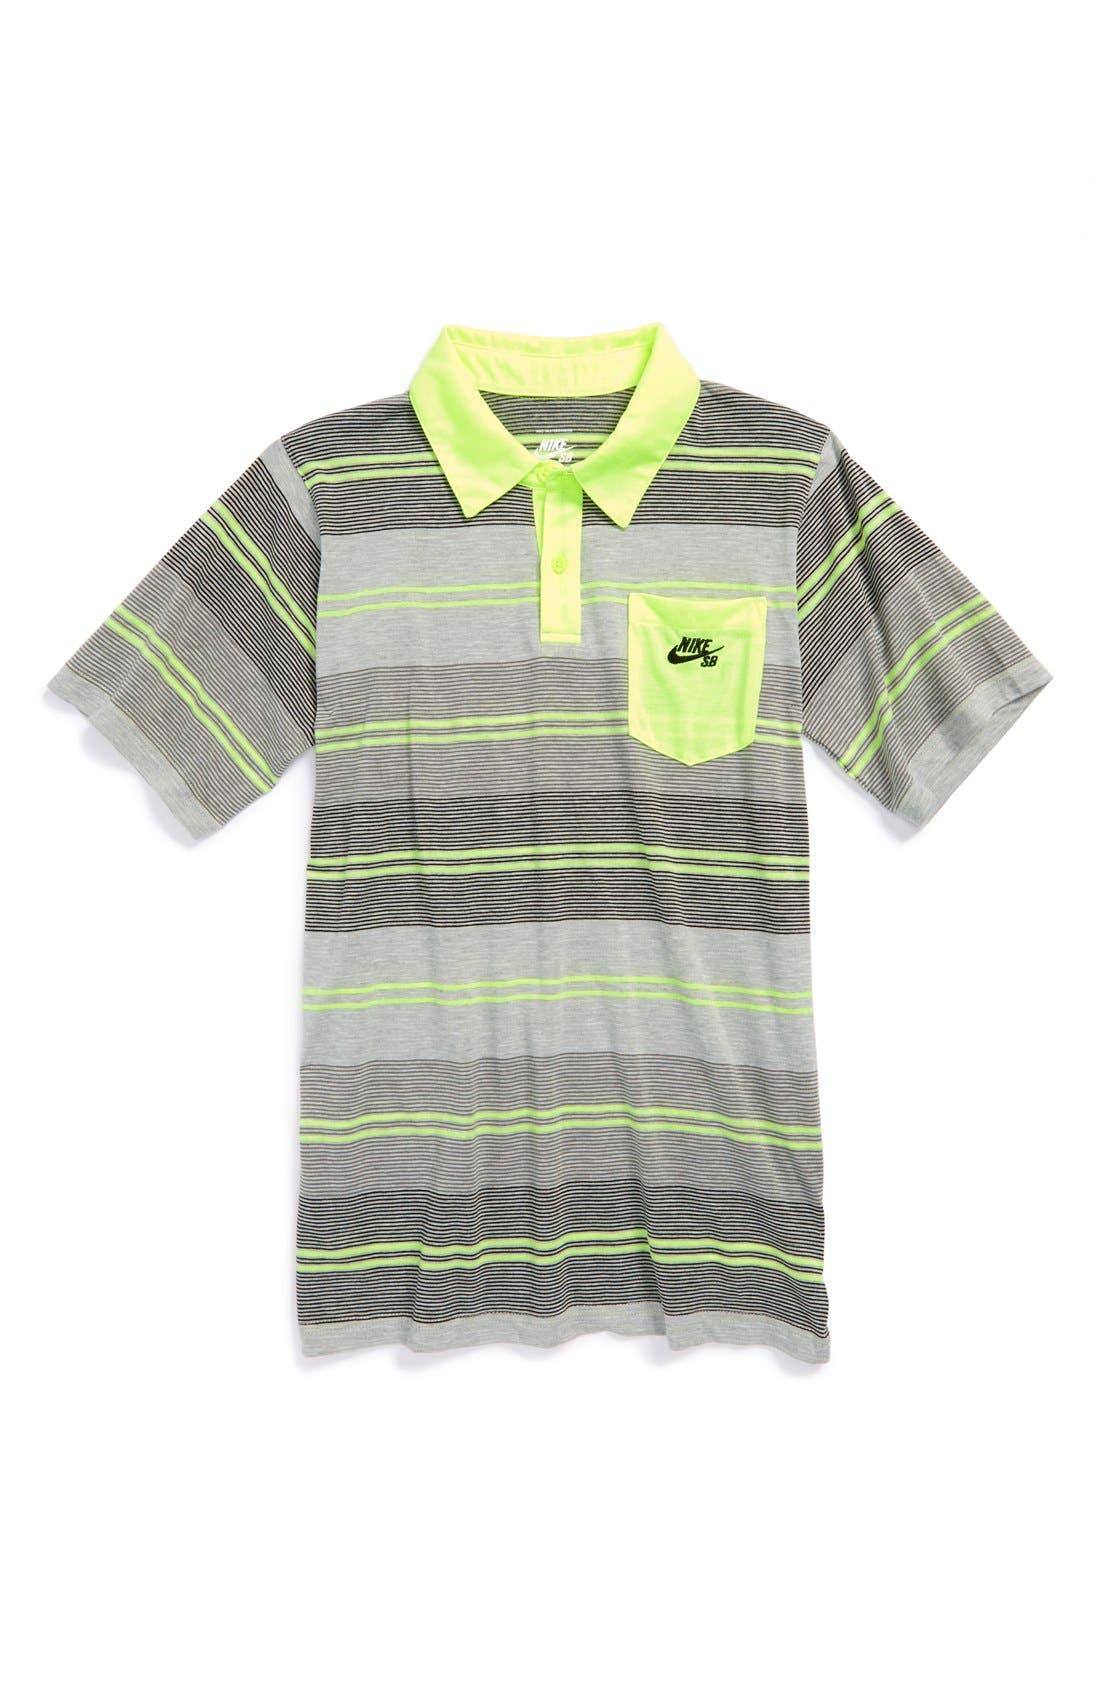 Alternate Image 1 Selected - Nike Skateboarding Neon Stripe Short Sleeve Polo (Big Boys)